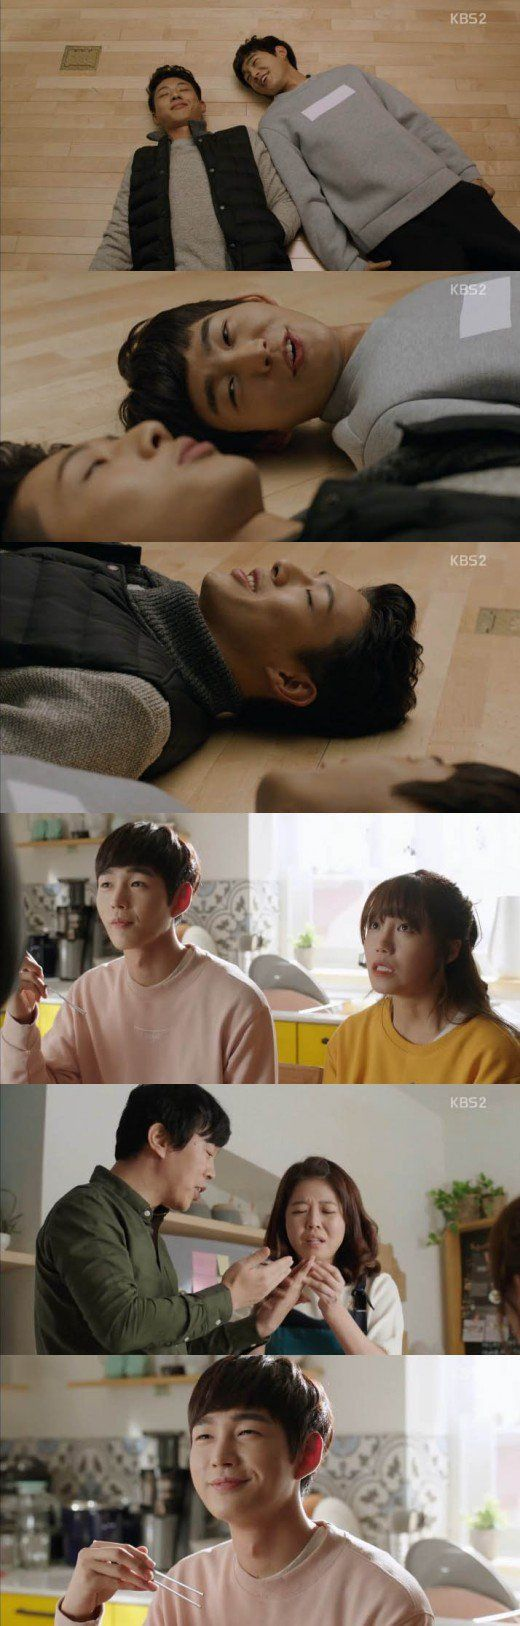 [Spoiler] 'Cheeky Go Go' It's happy ending, everybody smiled @ HanCinema :: The Korean Movie and Drama Database